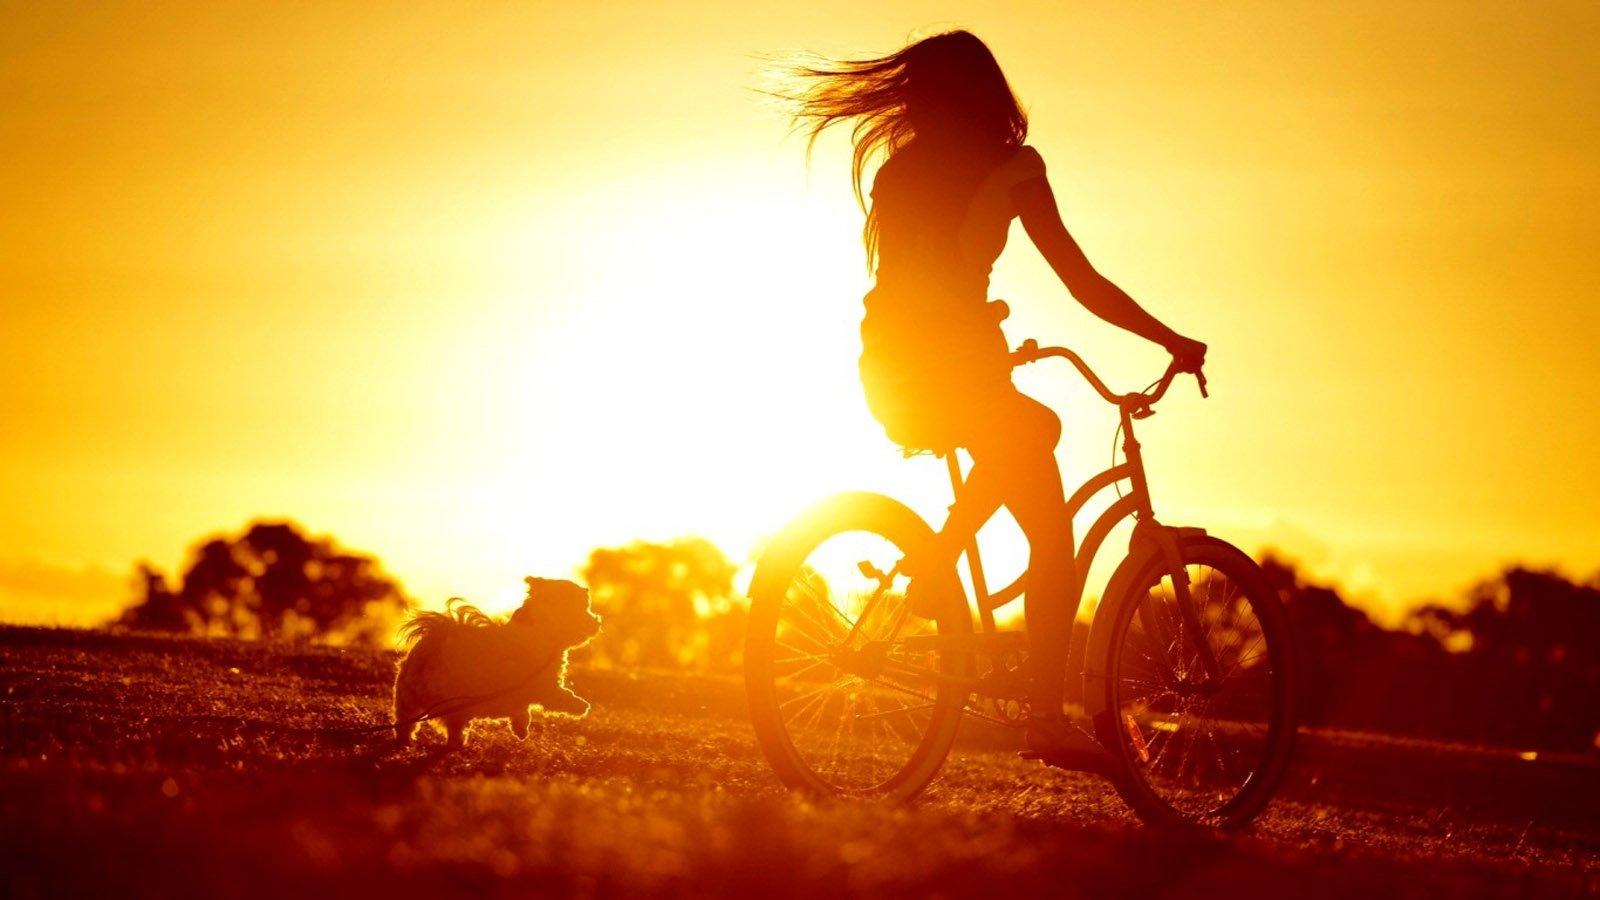 Mood sun sunlight bicycle dog cute girl wallpaper 1600x900 527040 wallpaperup - Happy mood wallpaper ...